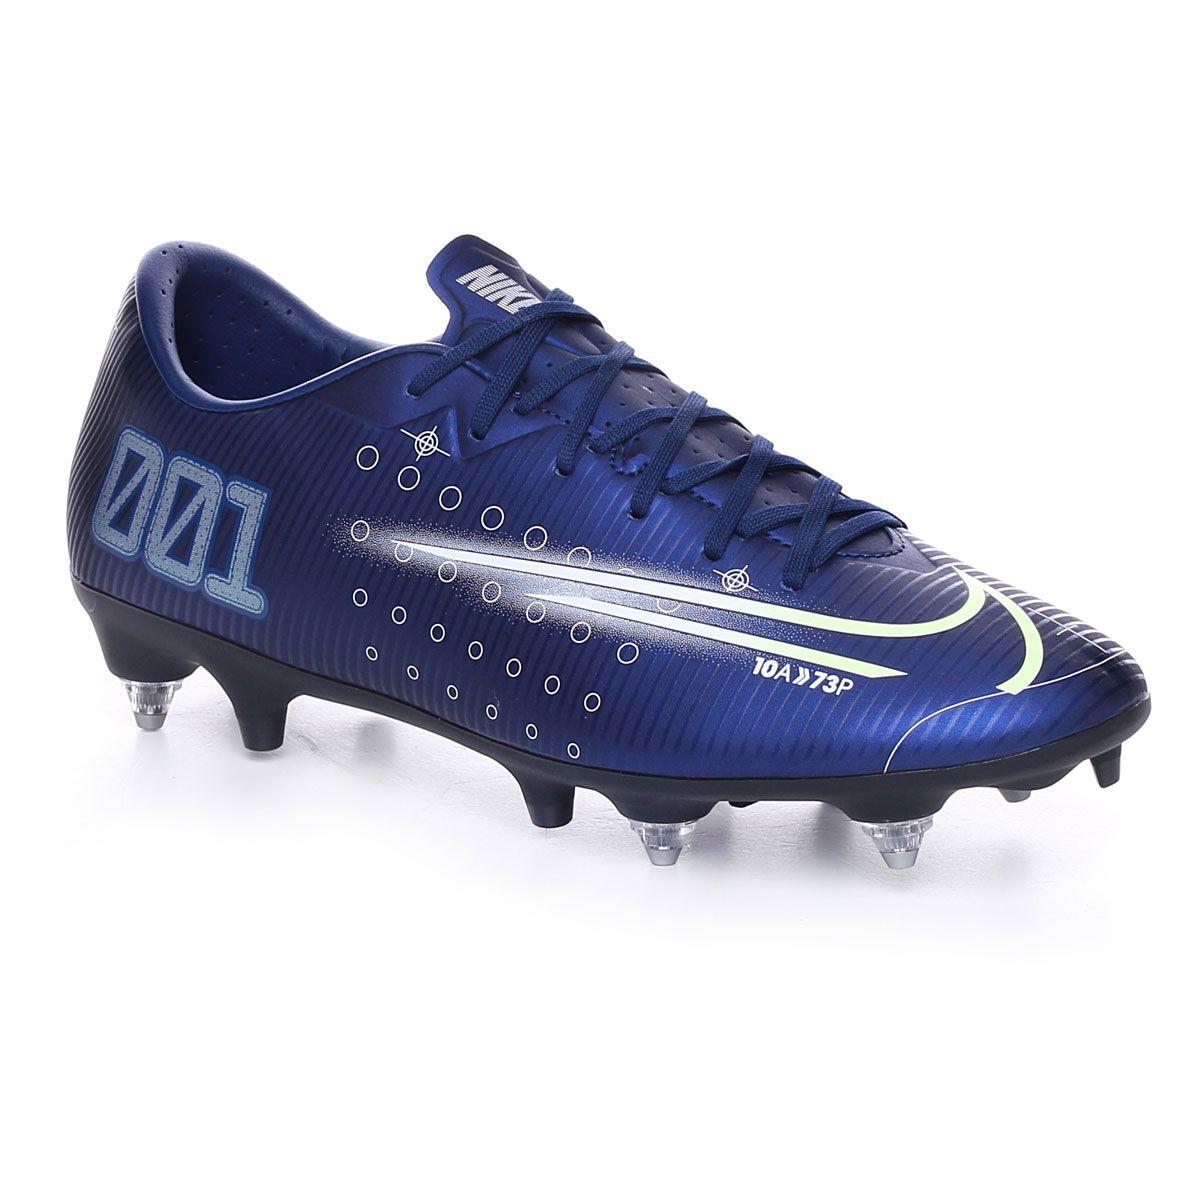 Nike Mercurial Vapor 13 Academy MDS SG-PRO Anti-Clog Traction Uomo Blue Void Metallic Silver